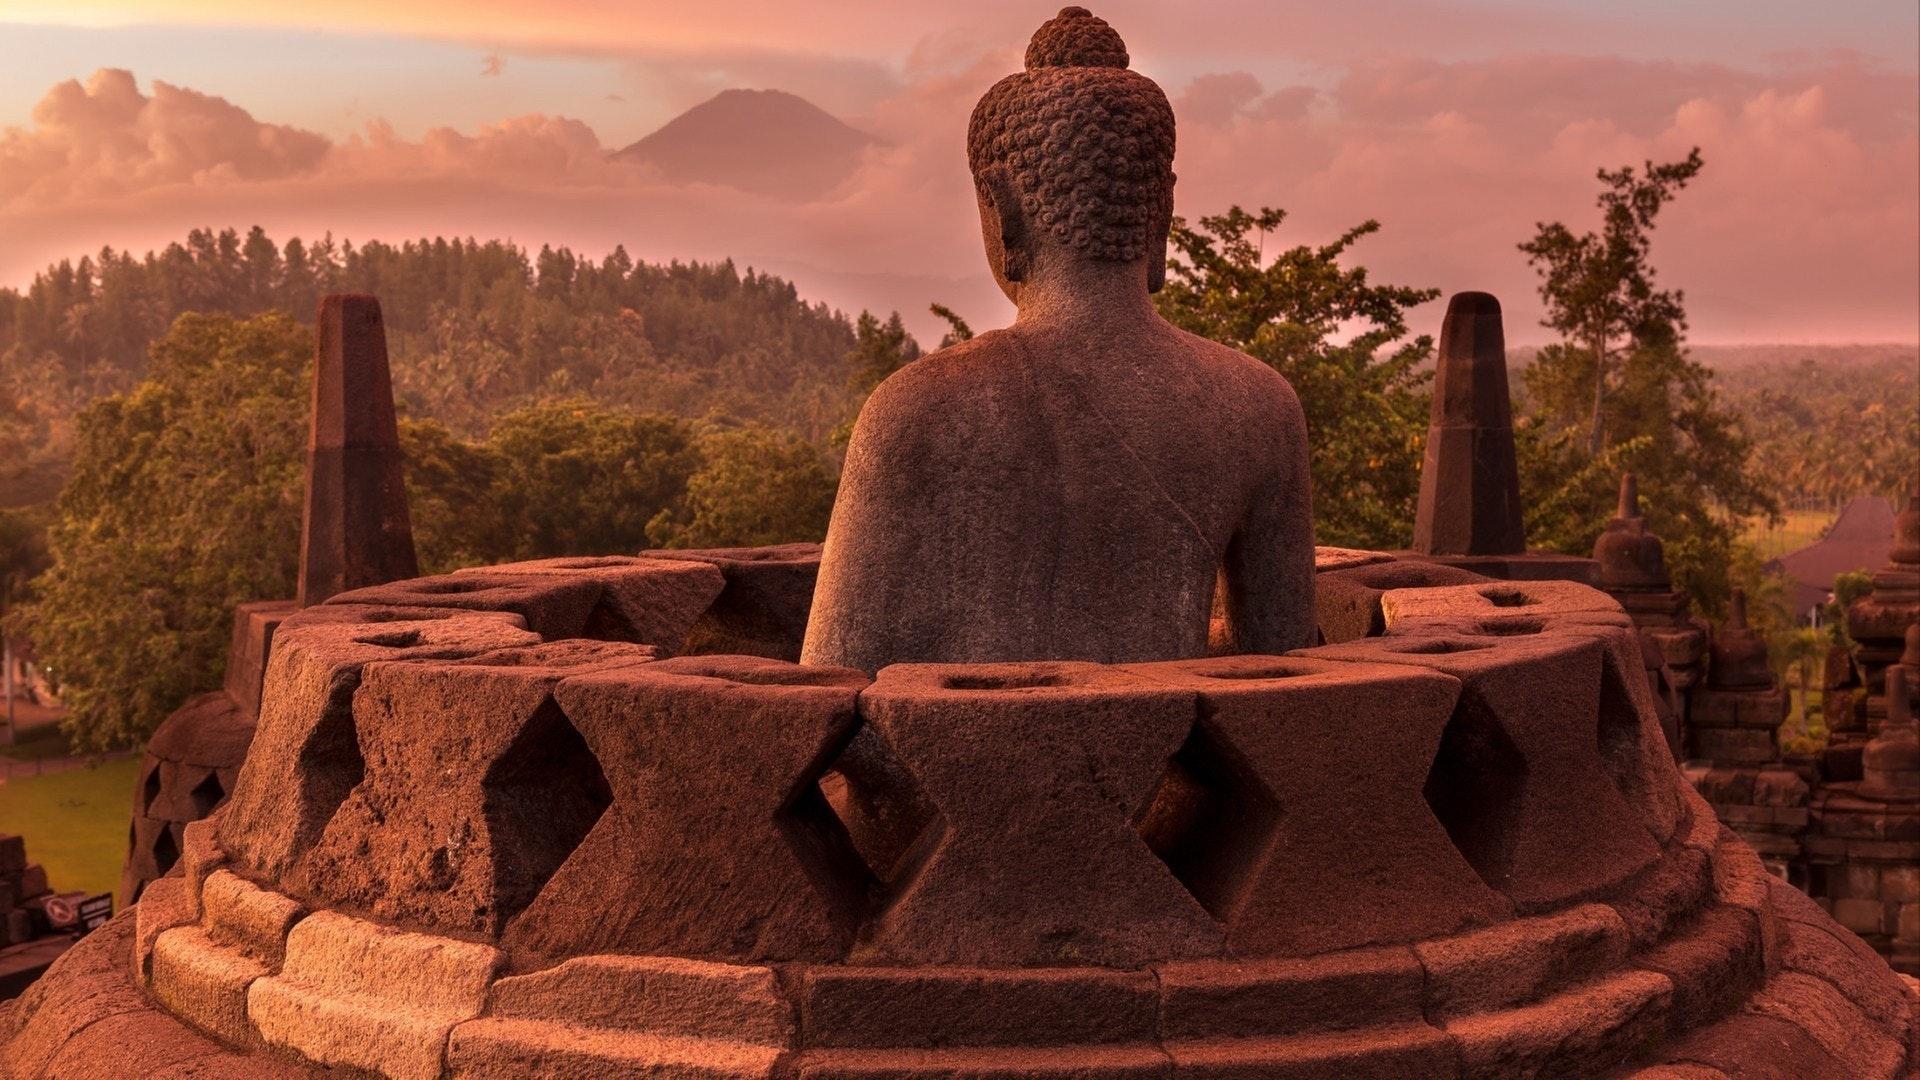 Buddist temple Borobudur at sunset. Yogyakarta